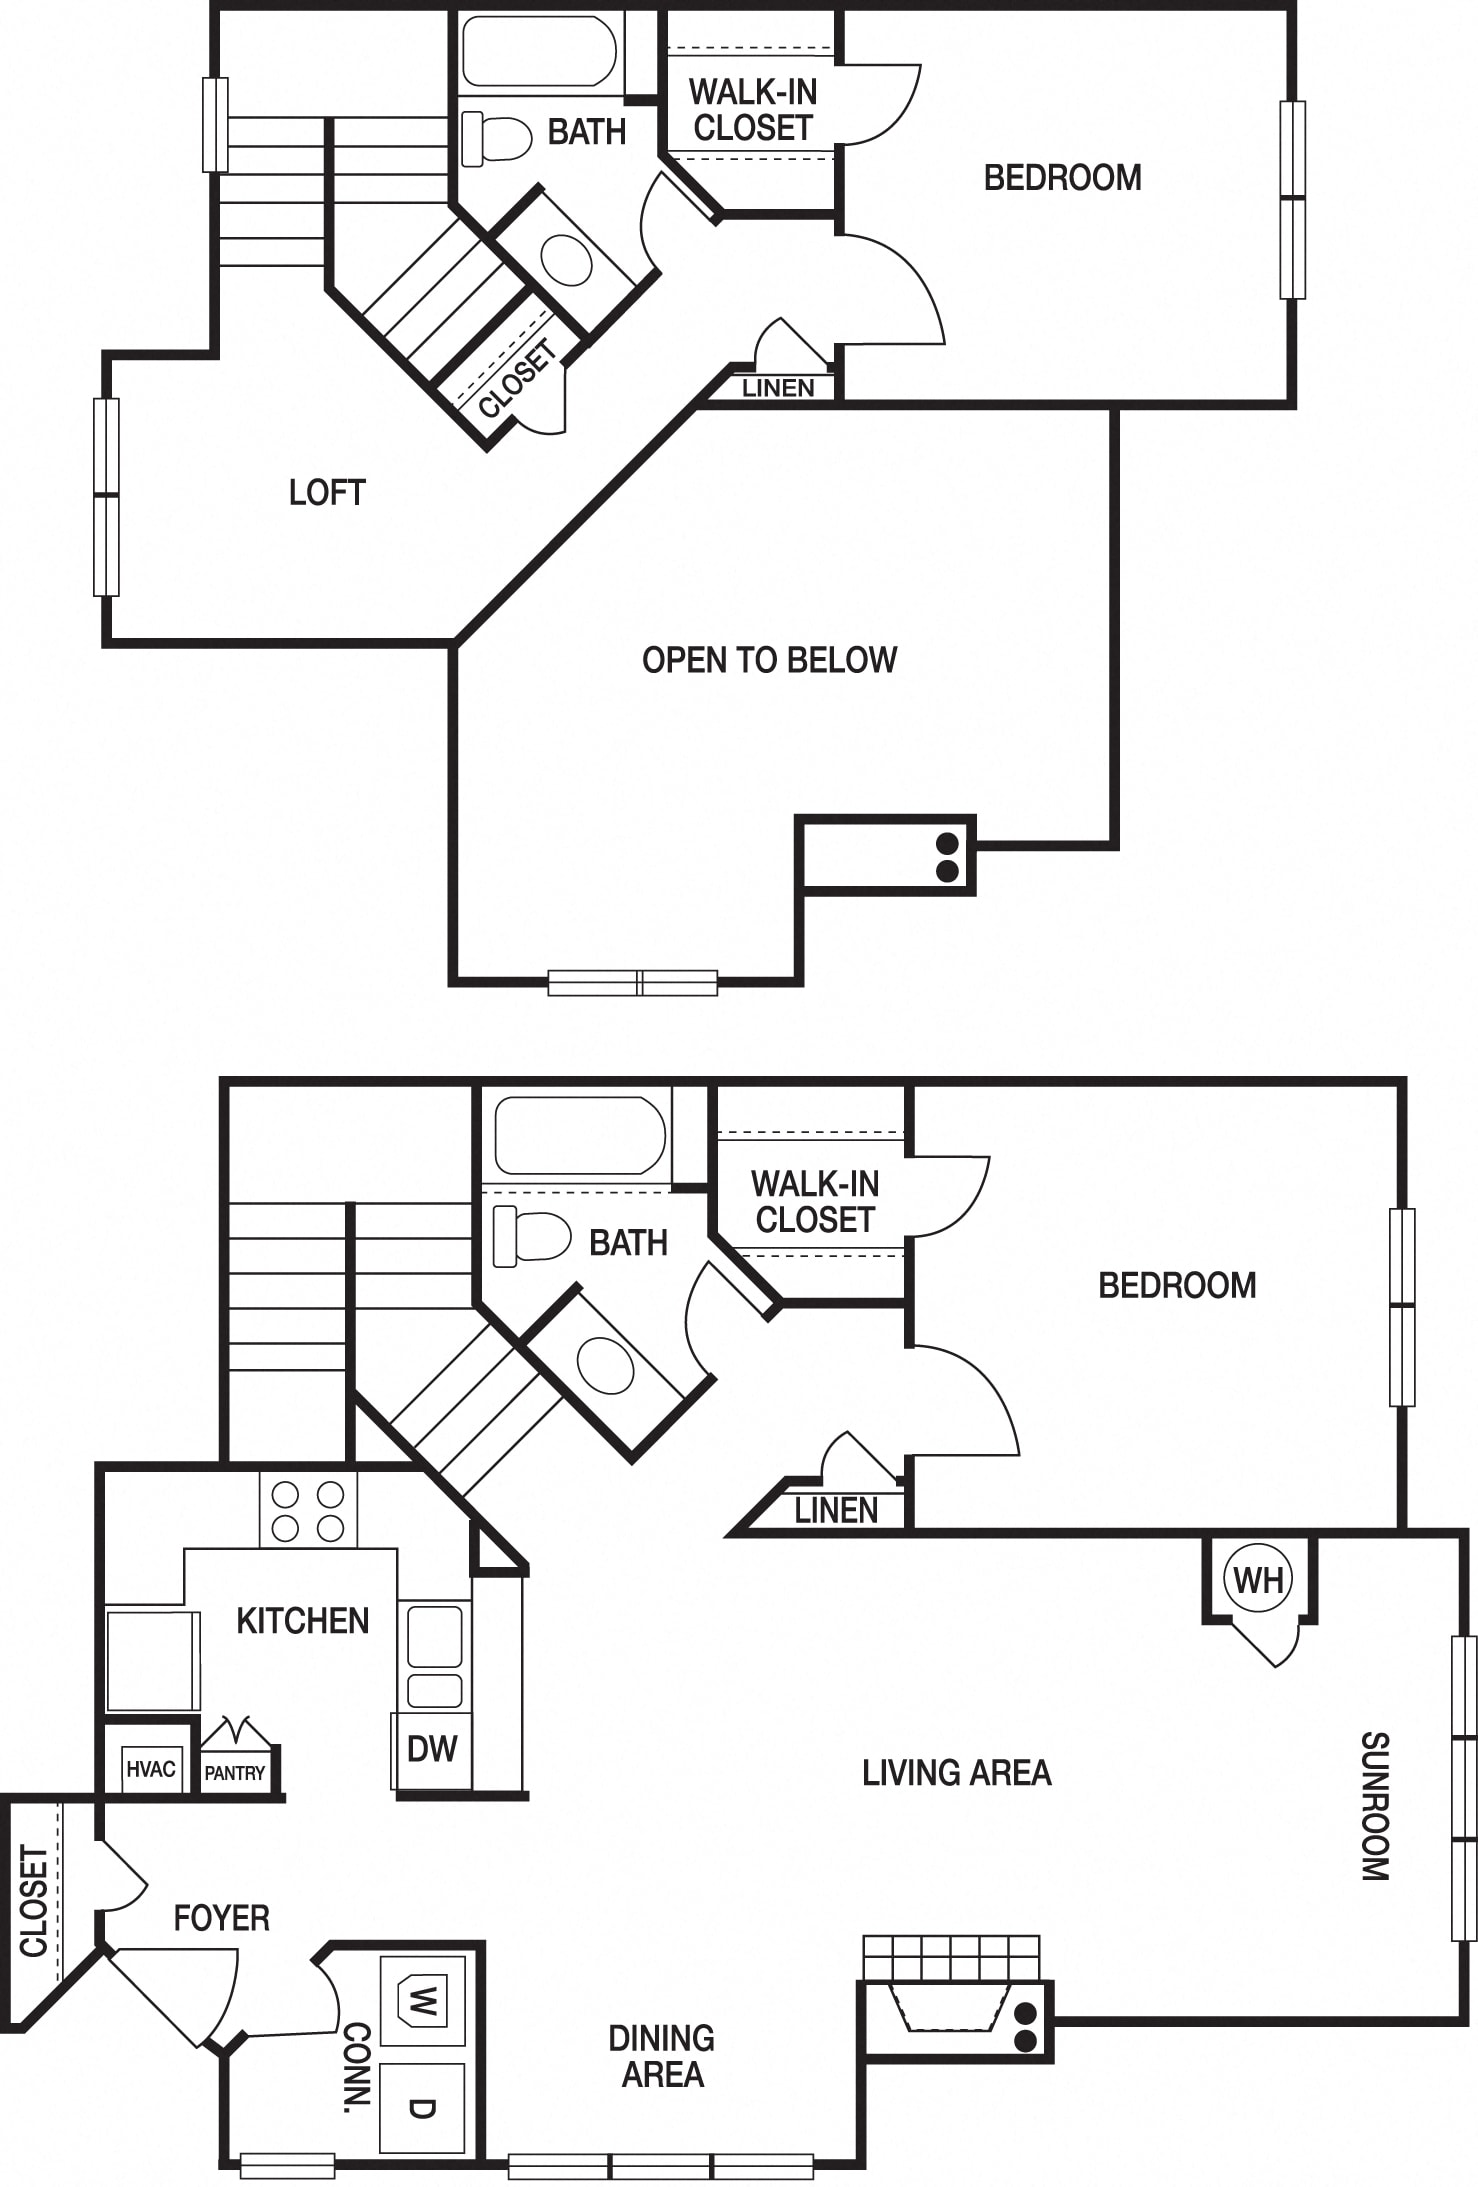 apartment unit floorplan view